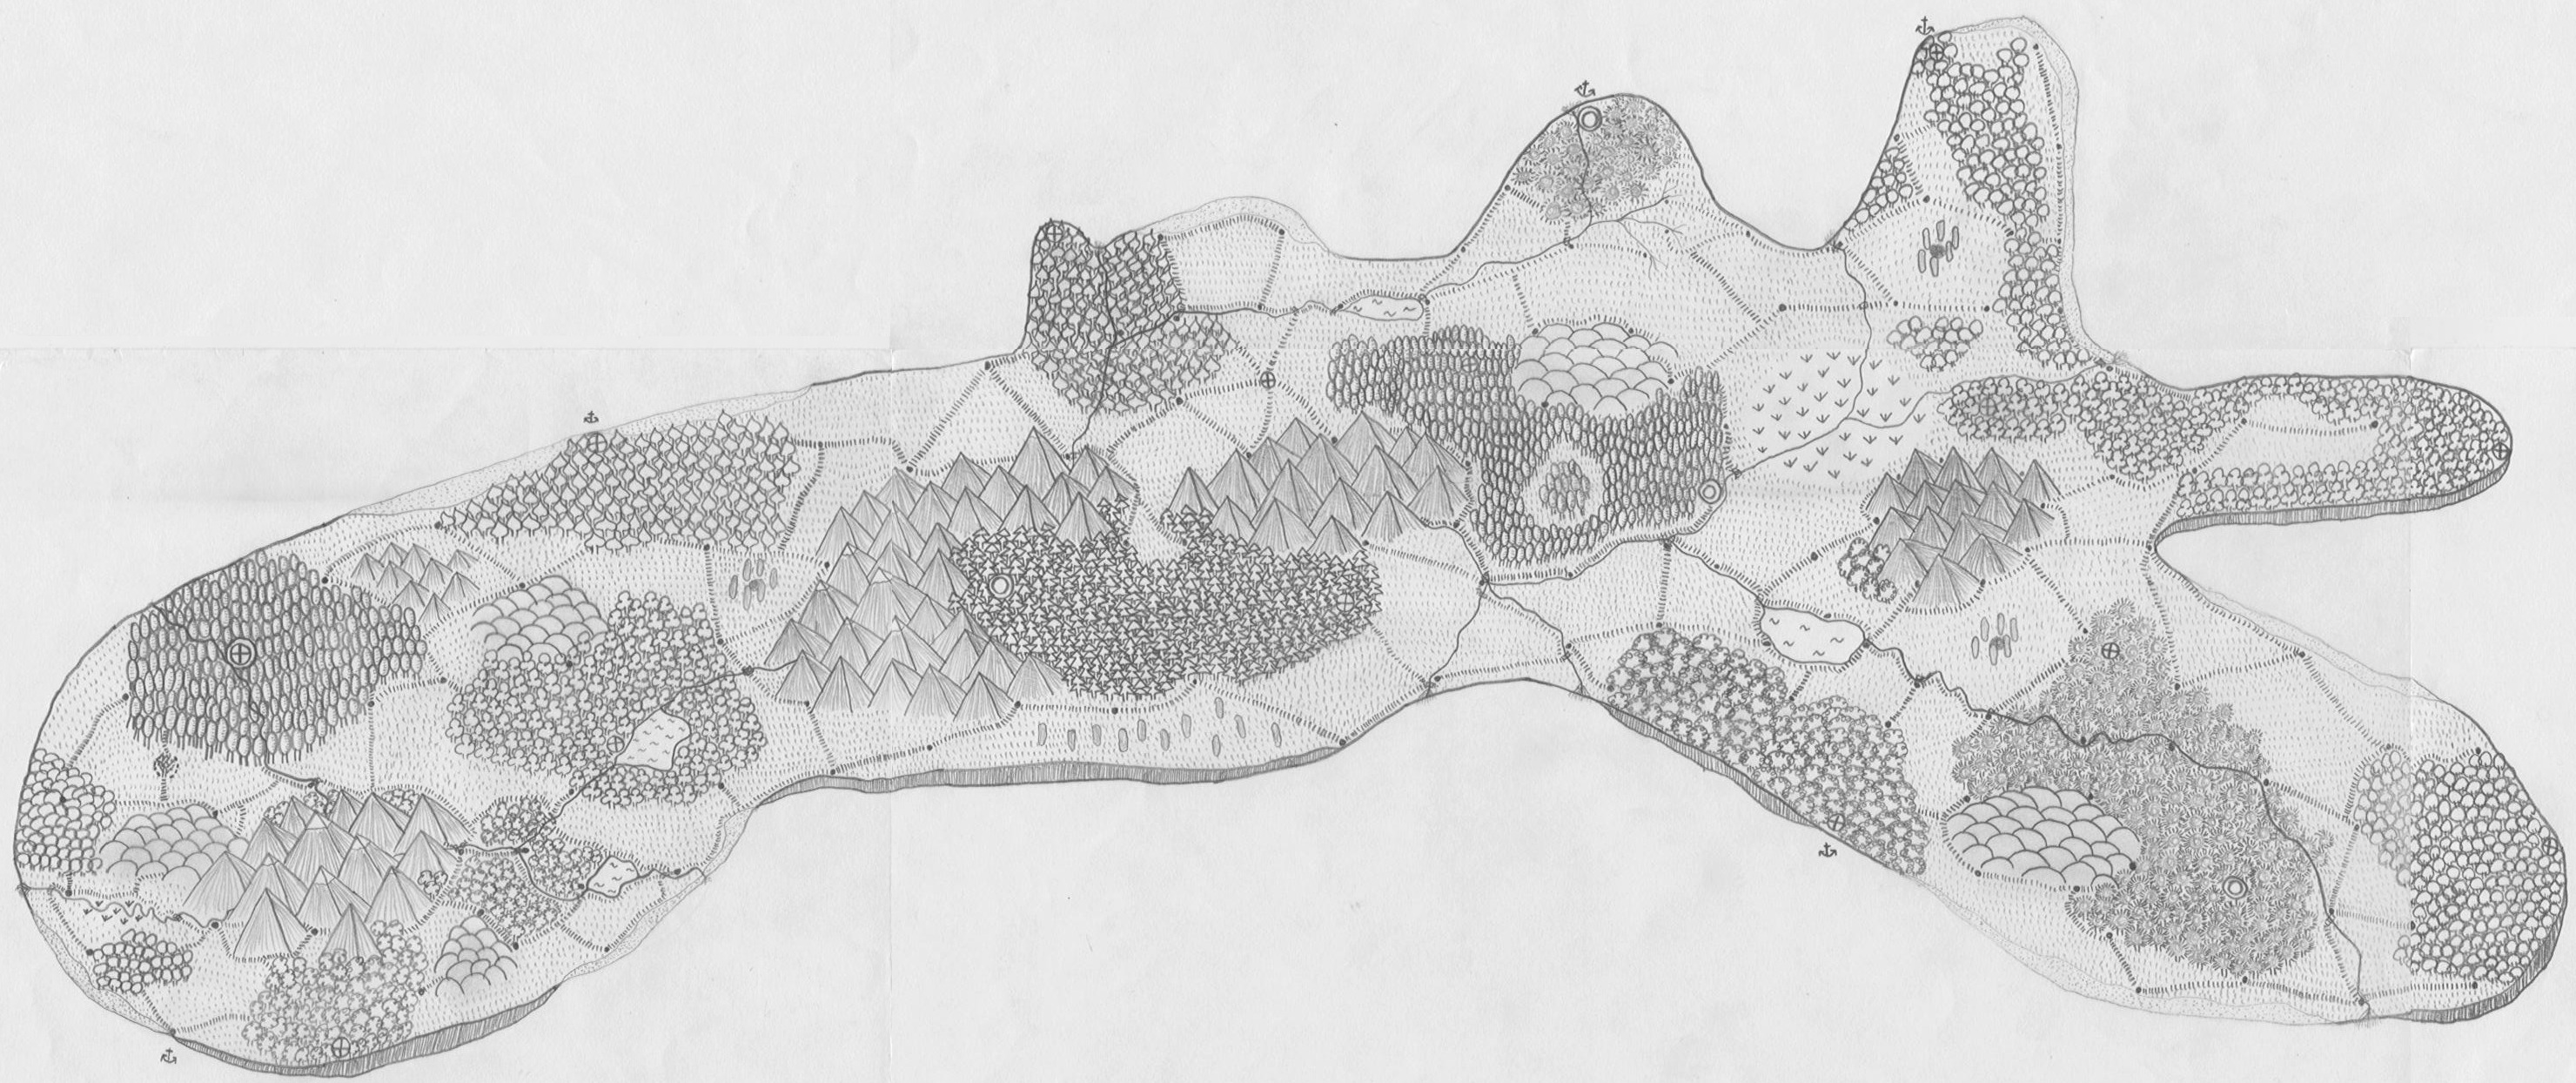 The druids island